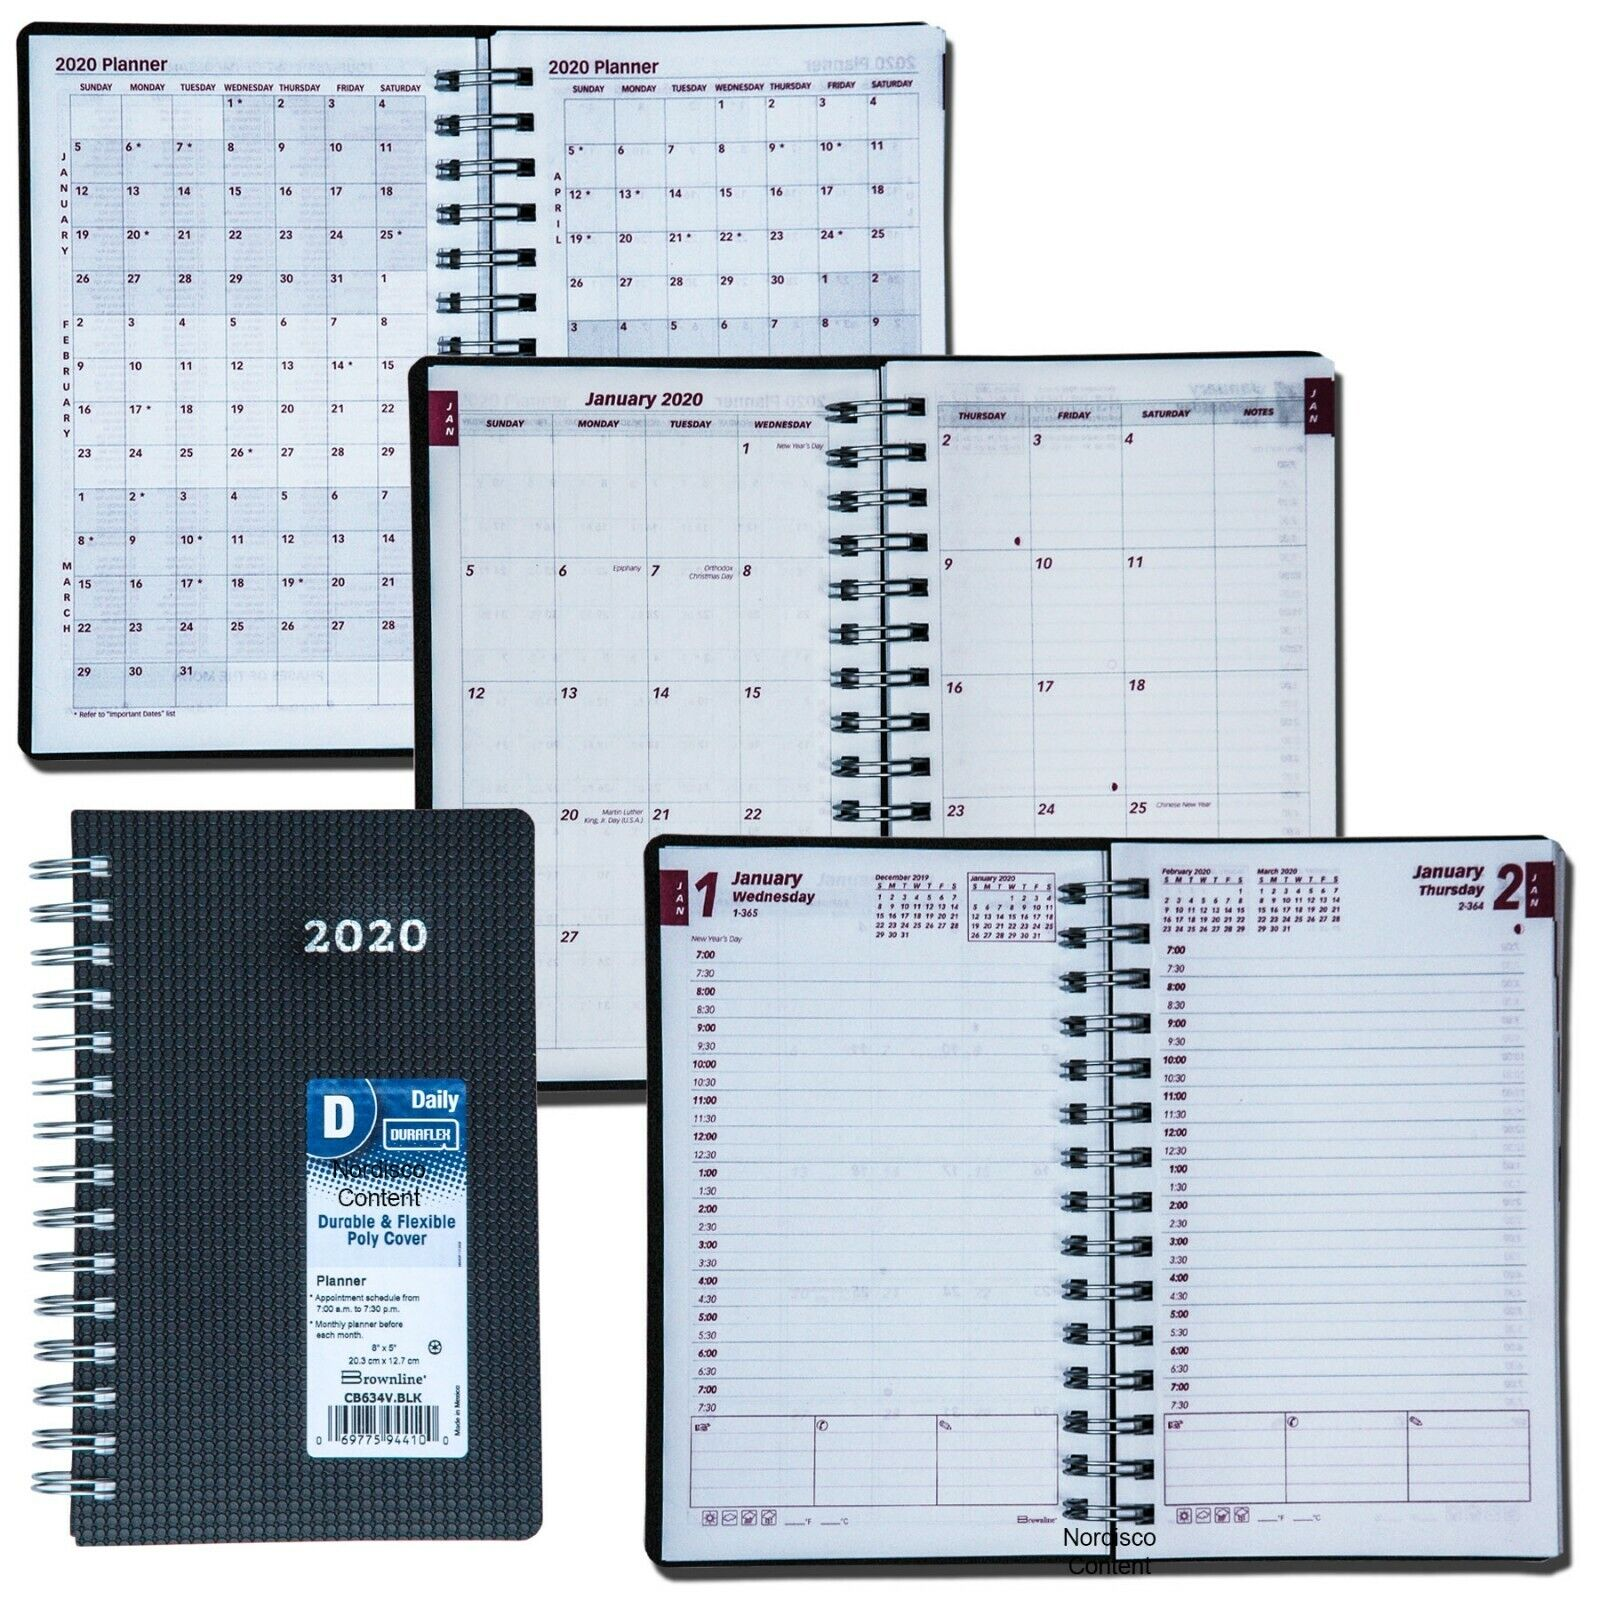 2020 cb634v blk duraflex daily planner appointment